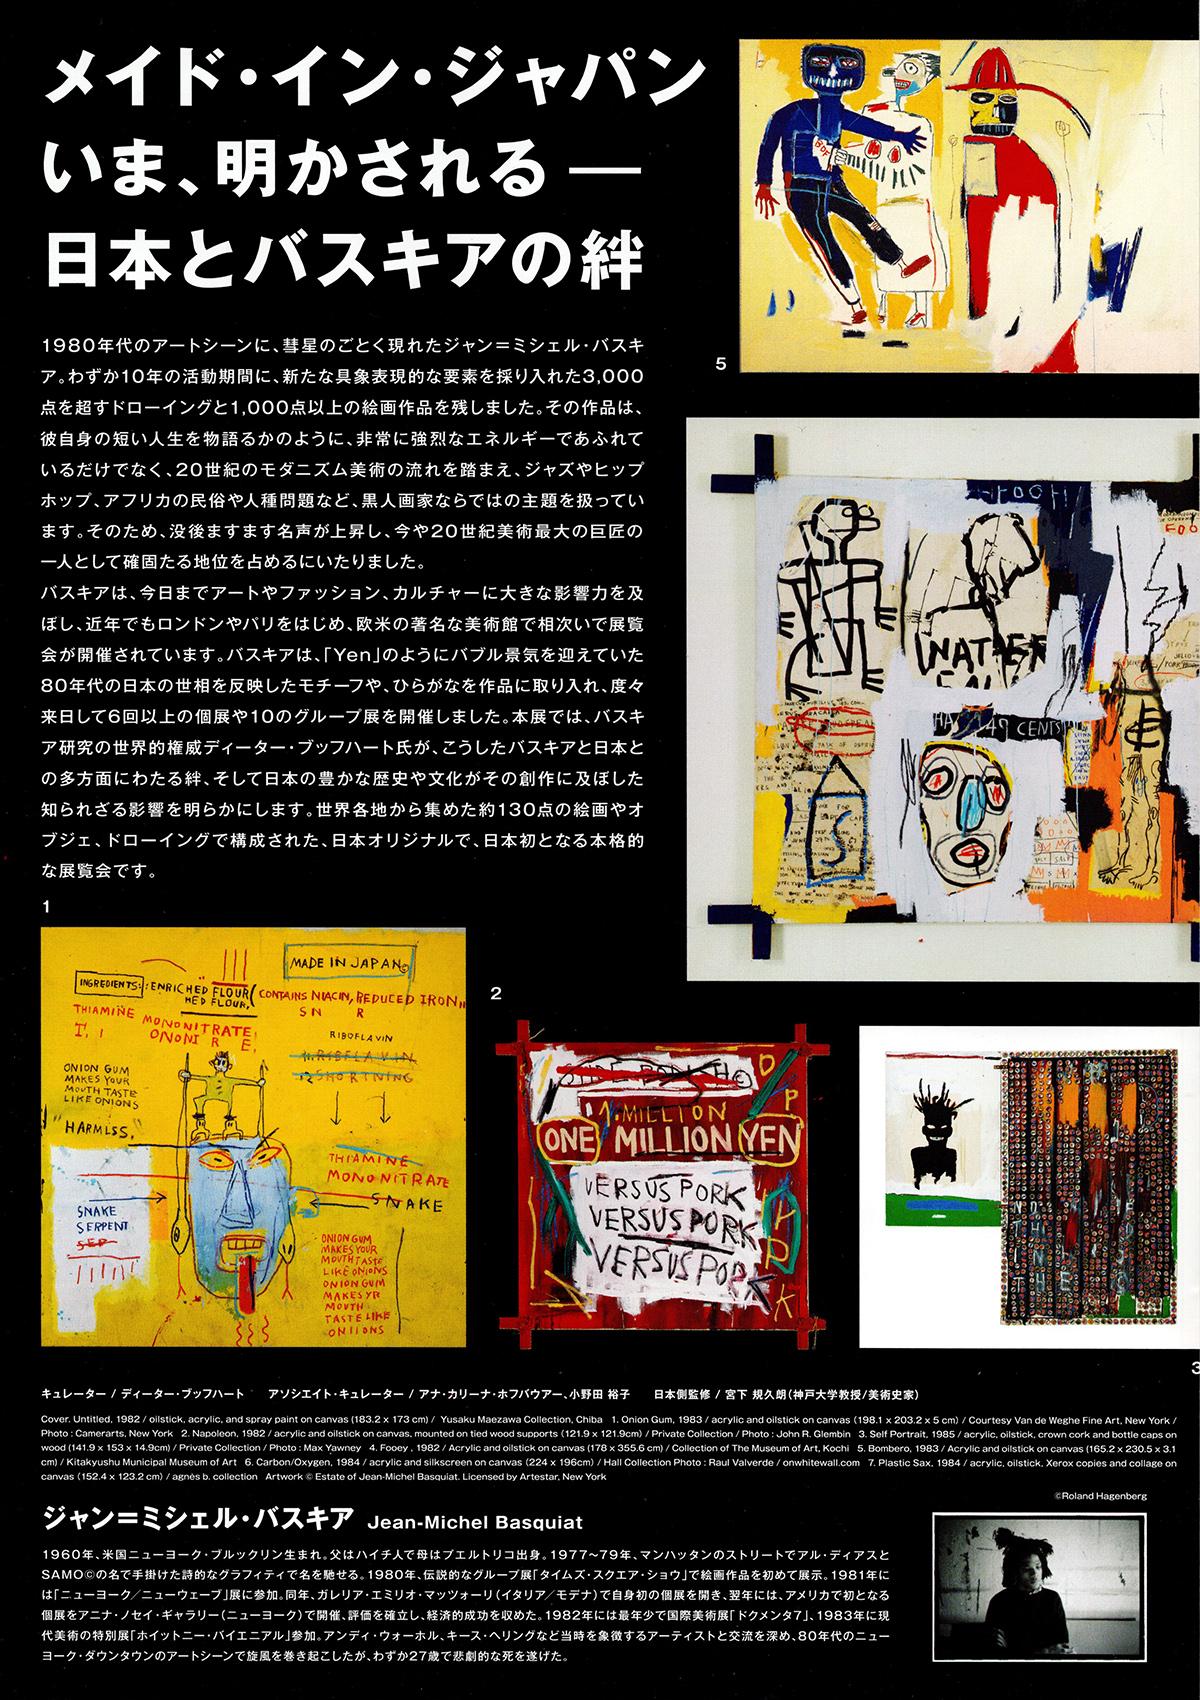 191113_basquiat2.jpg